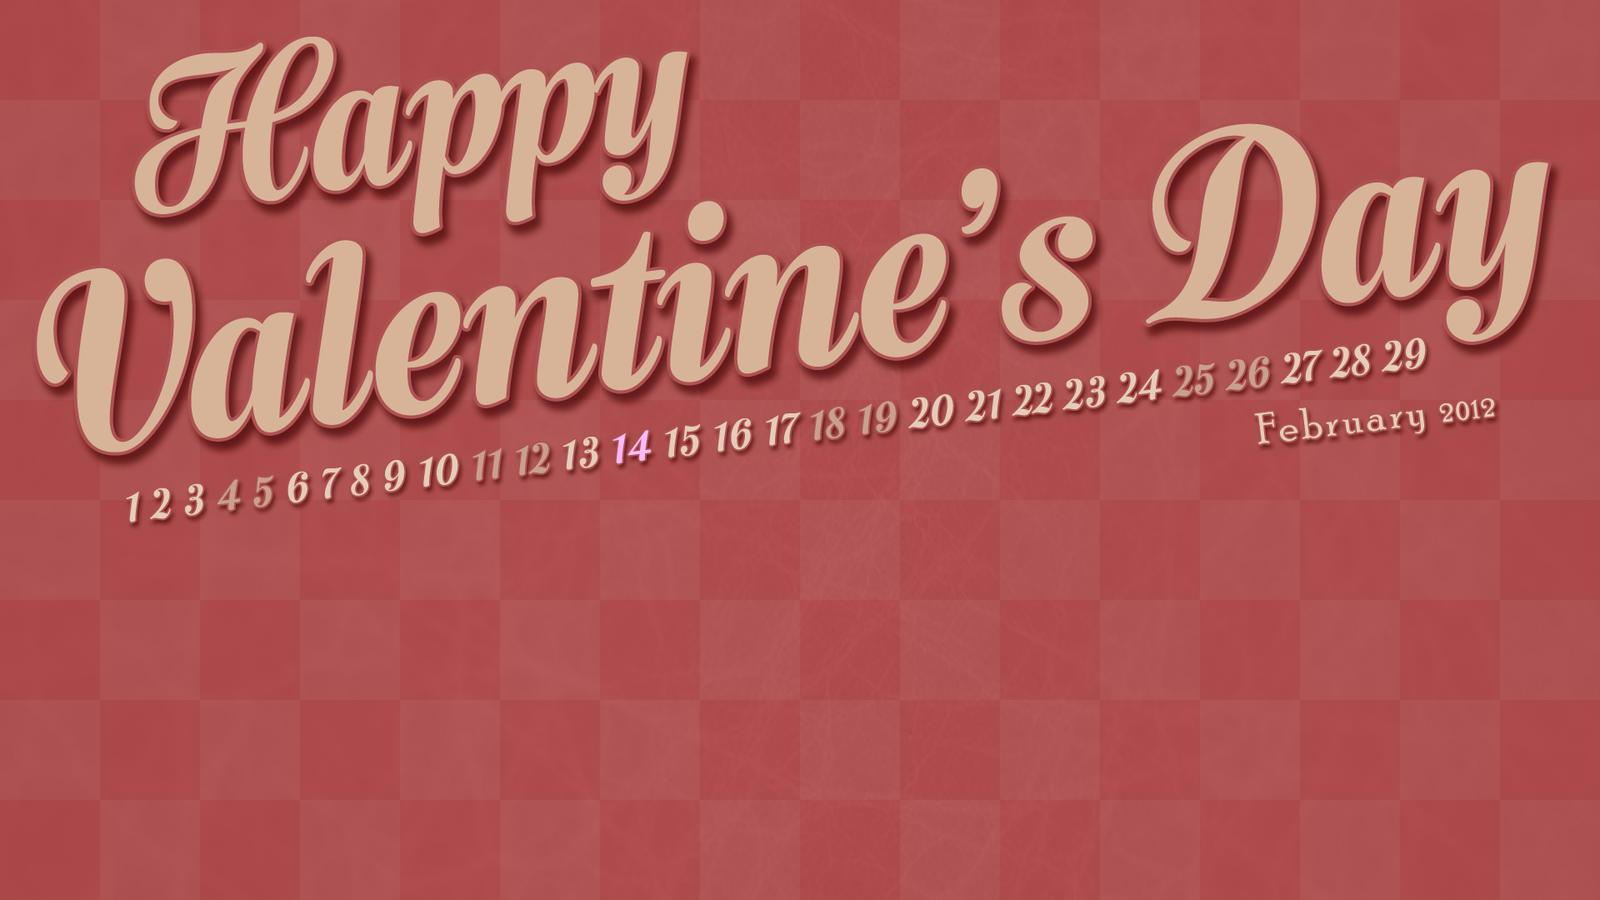 February 2012 Wallpaper Calendar by MetalFrog